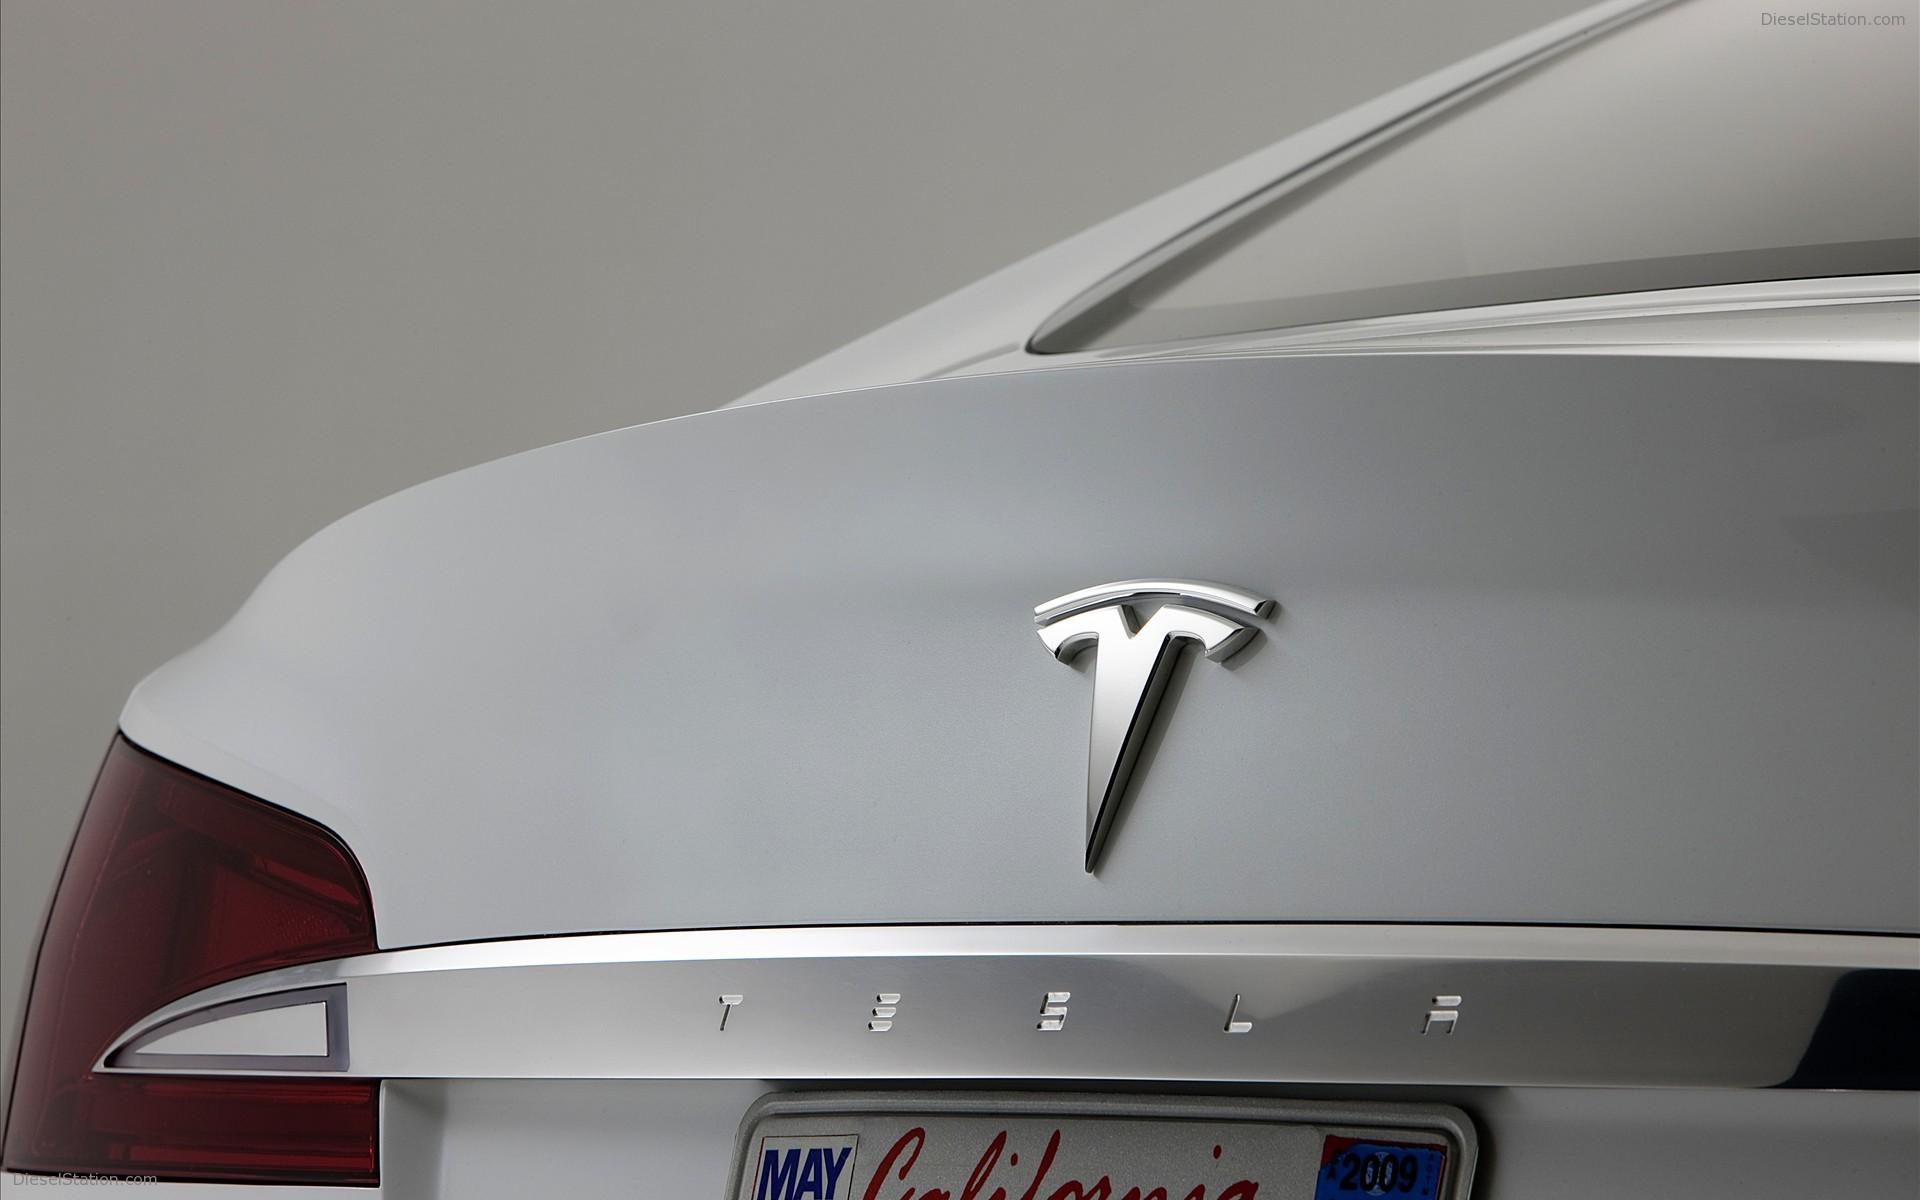 2010 Tesla Model S Concept HD Desktop Wallpaper 1920x1200